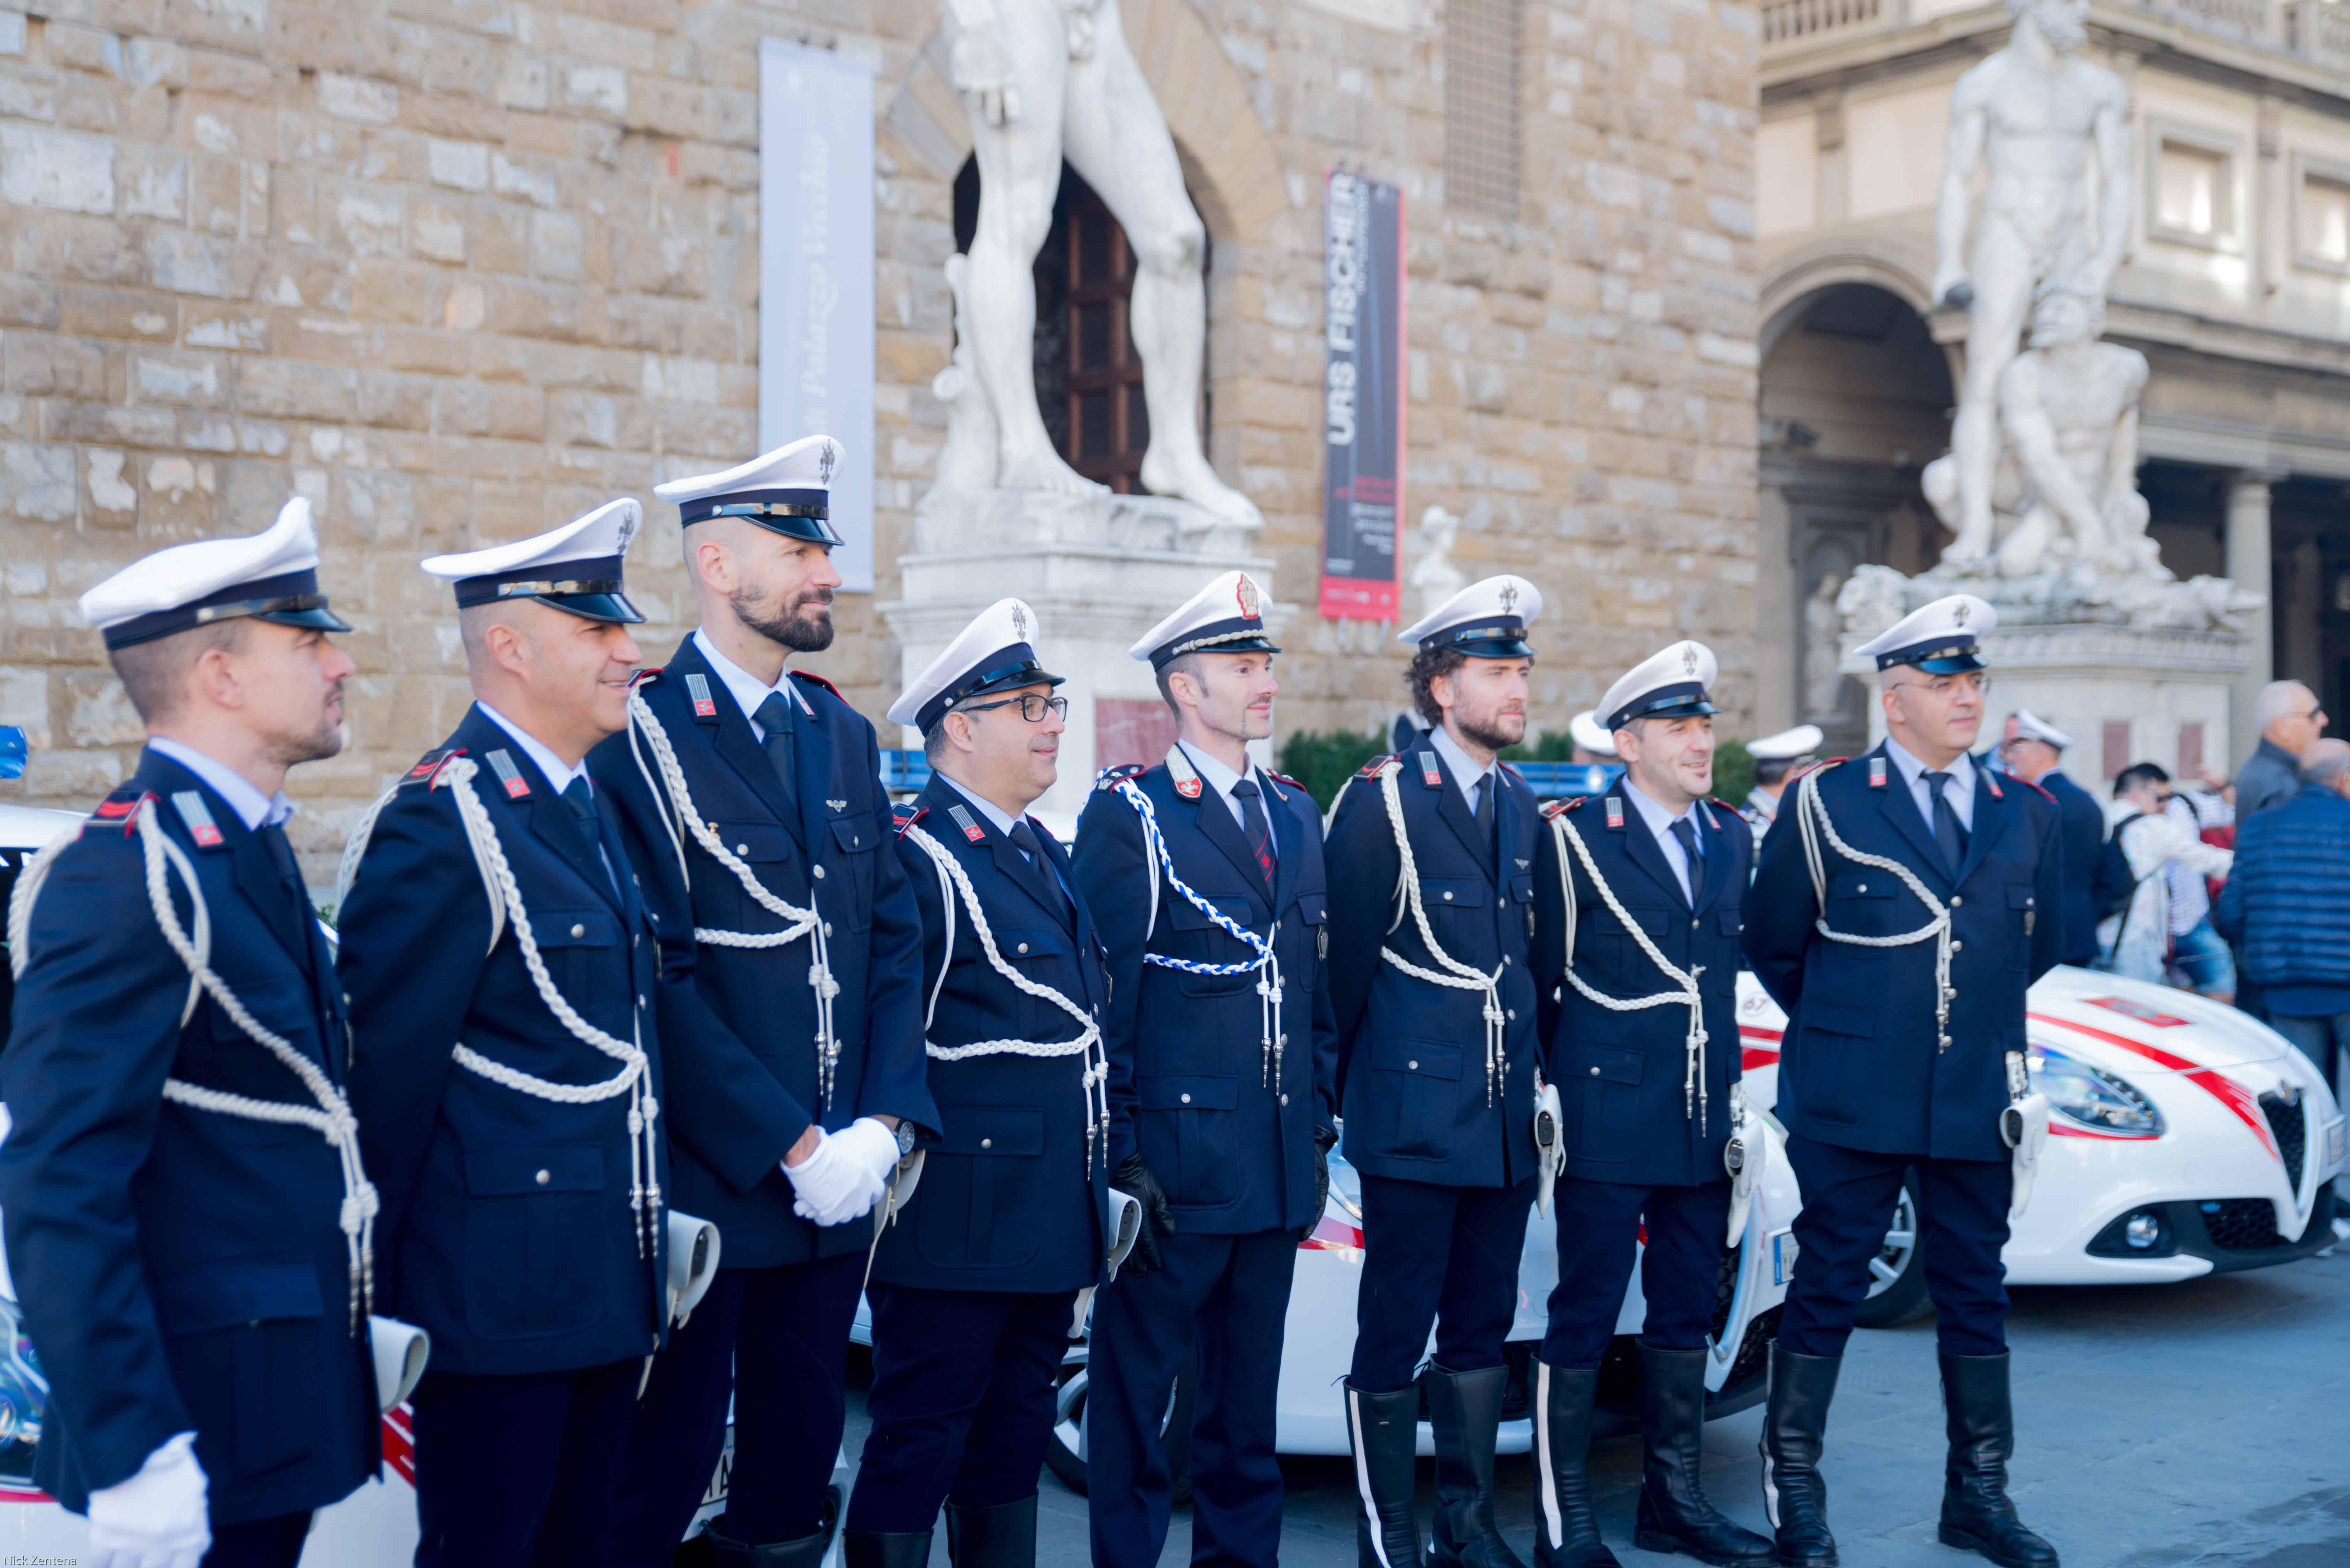 Florence municipal police